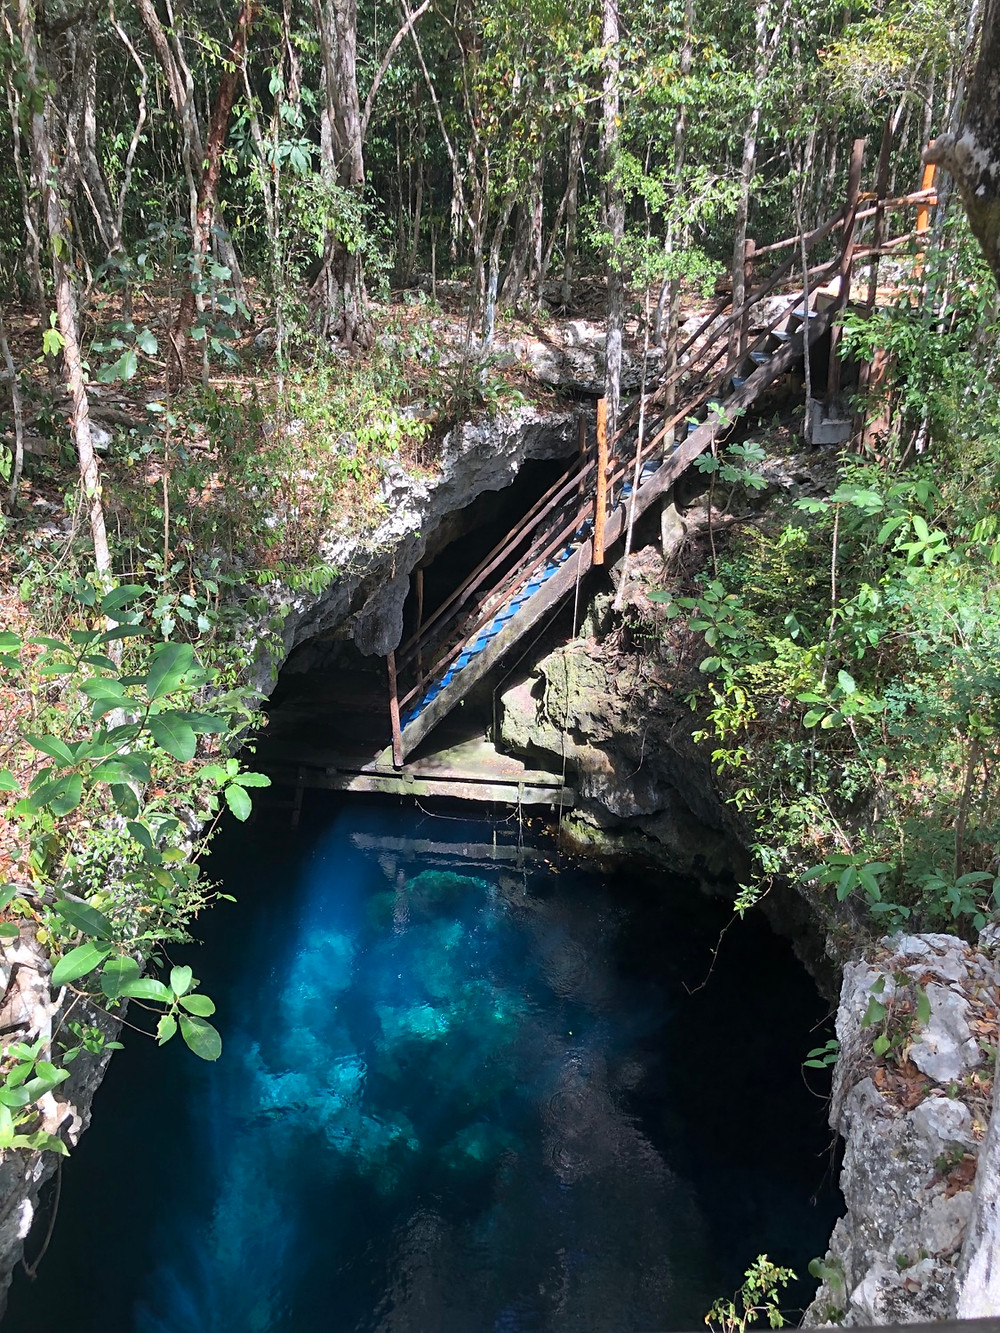 Tulum-Cenote-tauchen-el-pit-erfahrungTulum-Cenote-tauchen-el-pit-erfahrung